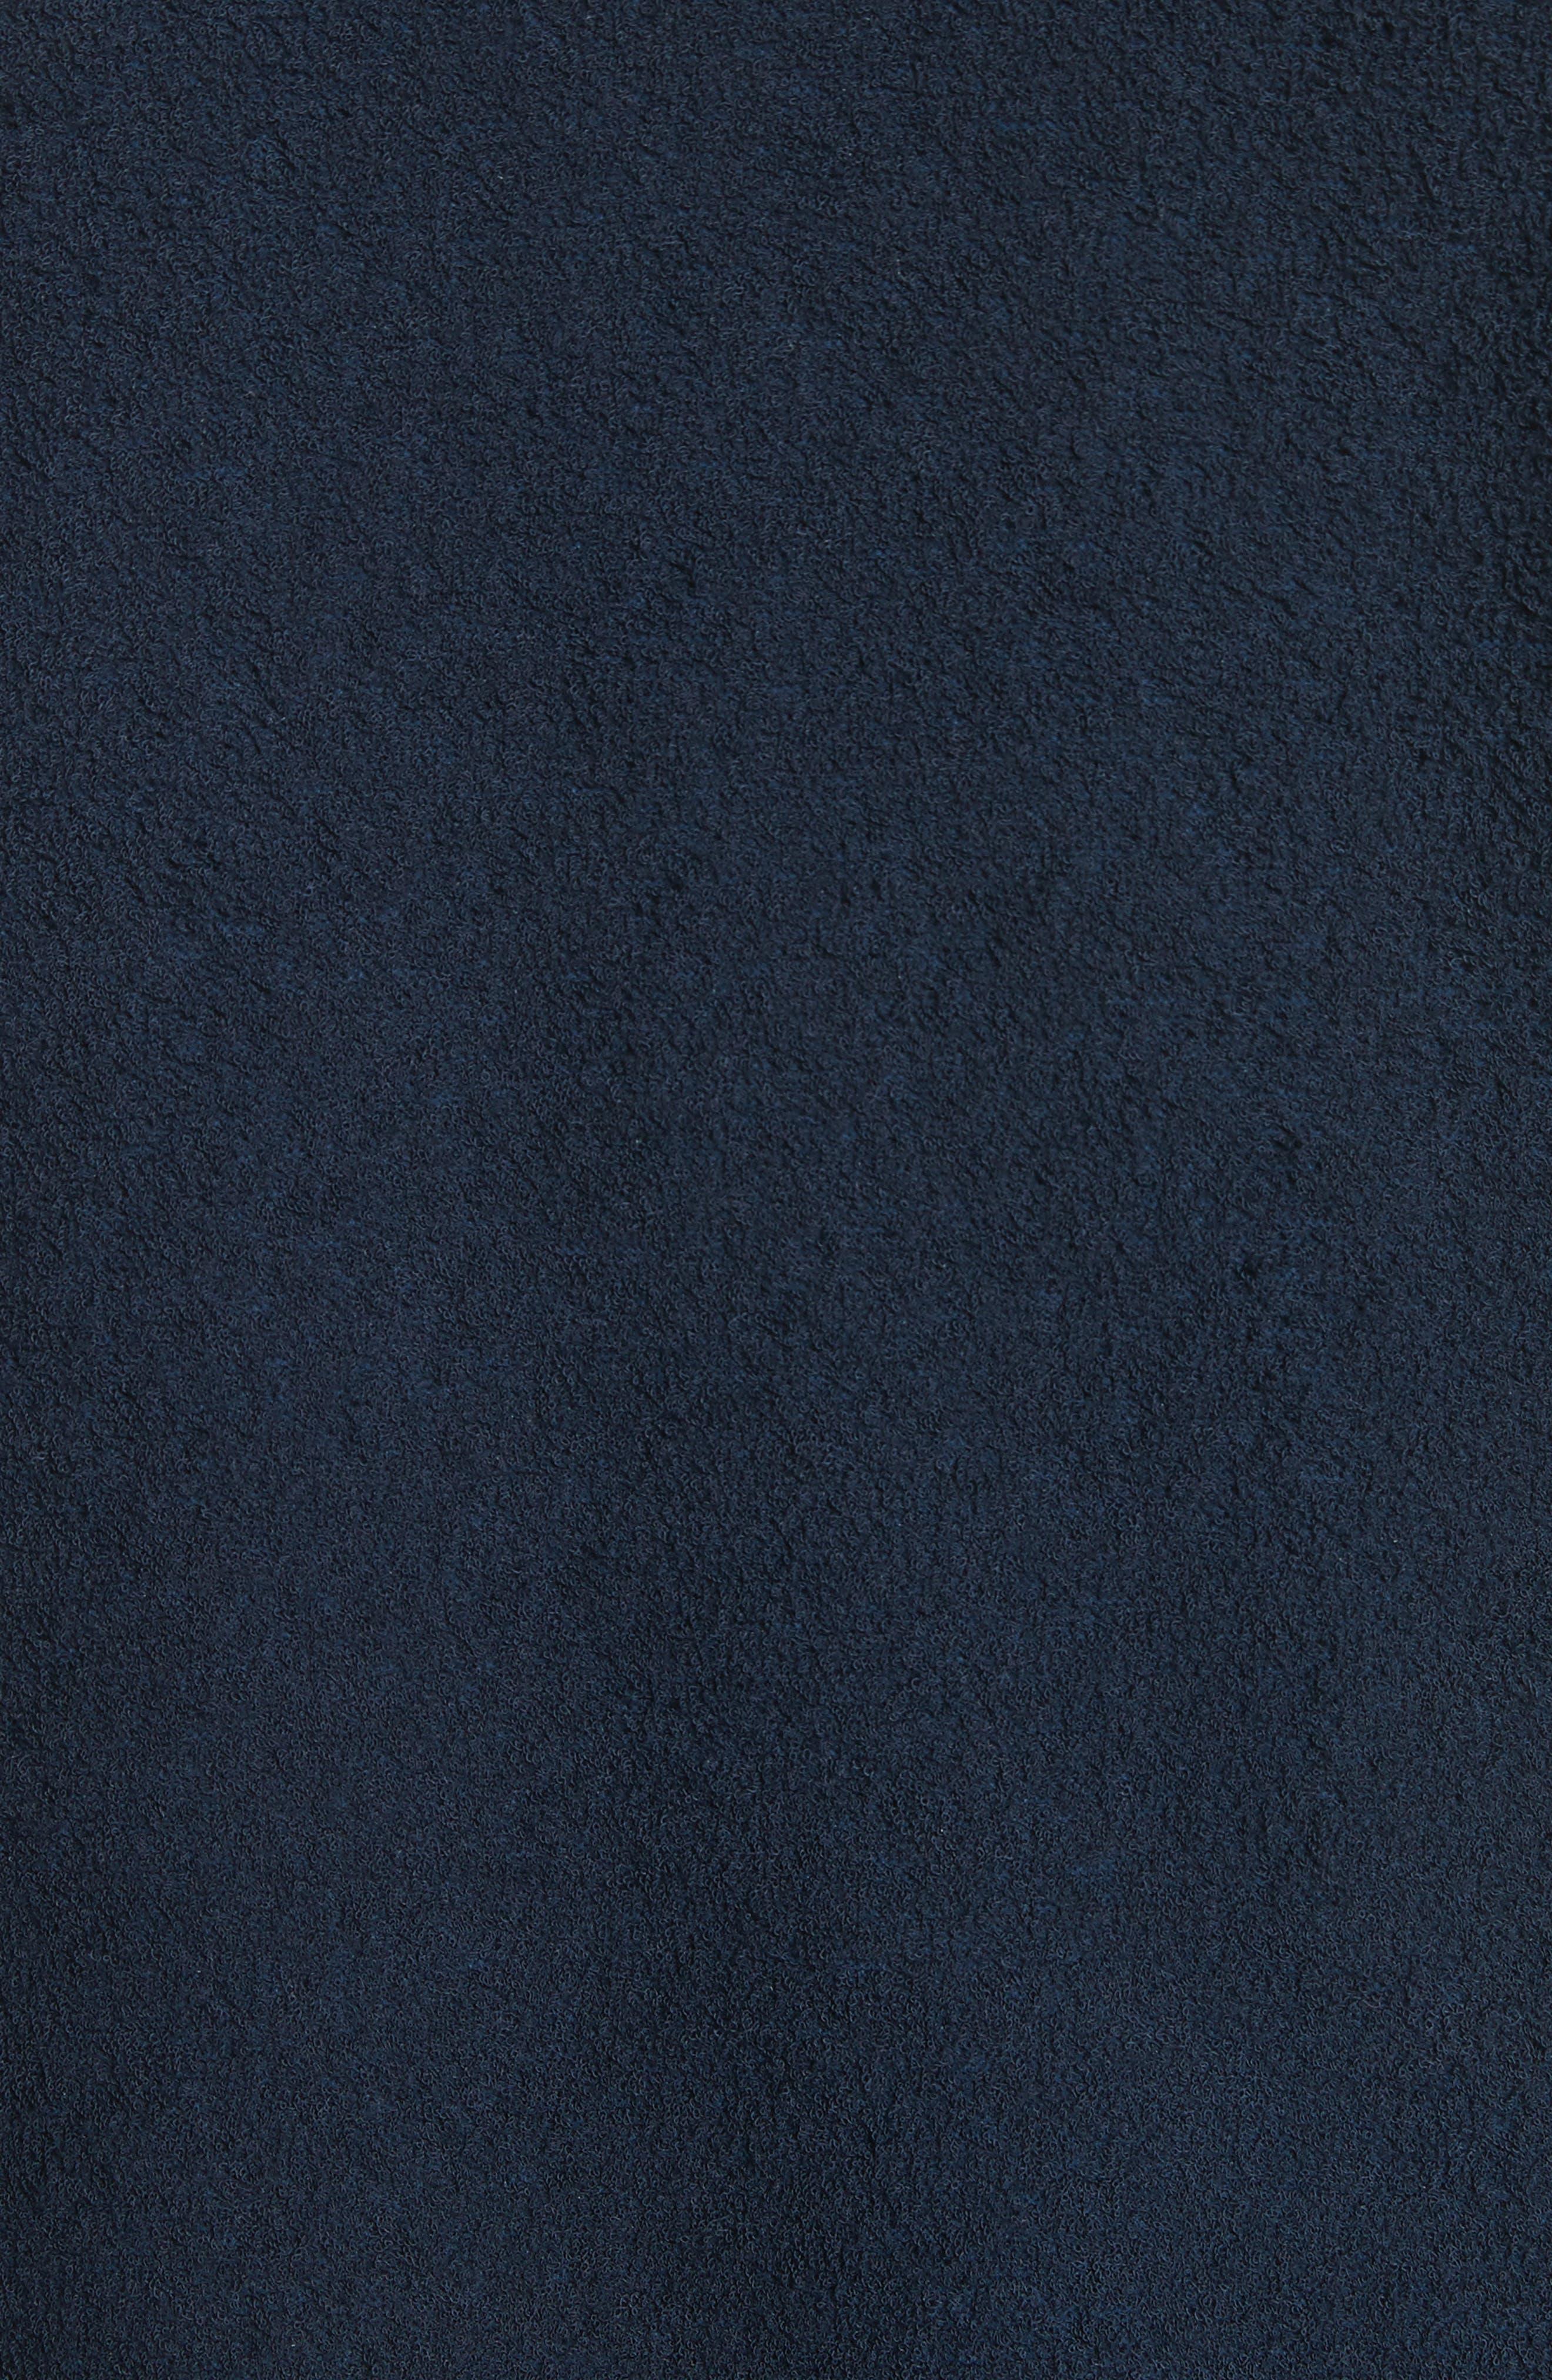 Rask Crewneck Sweatshirt,                             Alternate thumbnail 5, color,                             Dark Navy